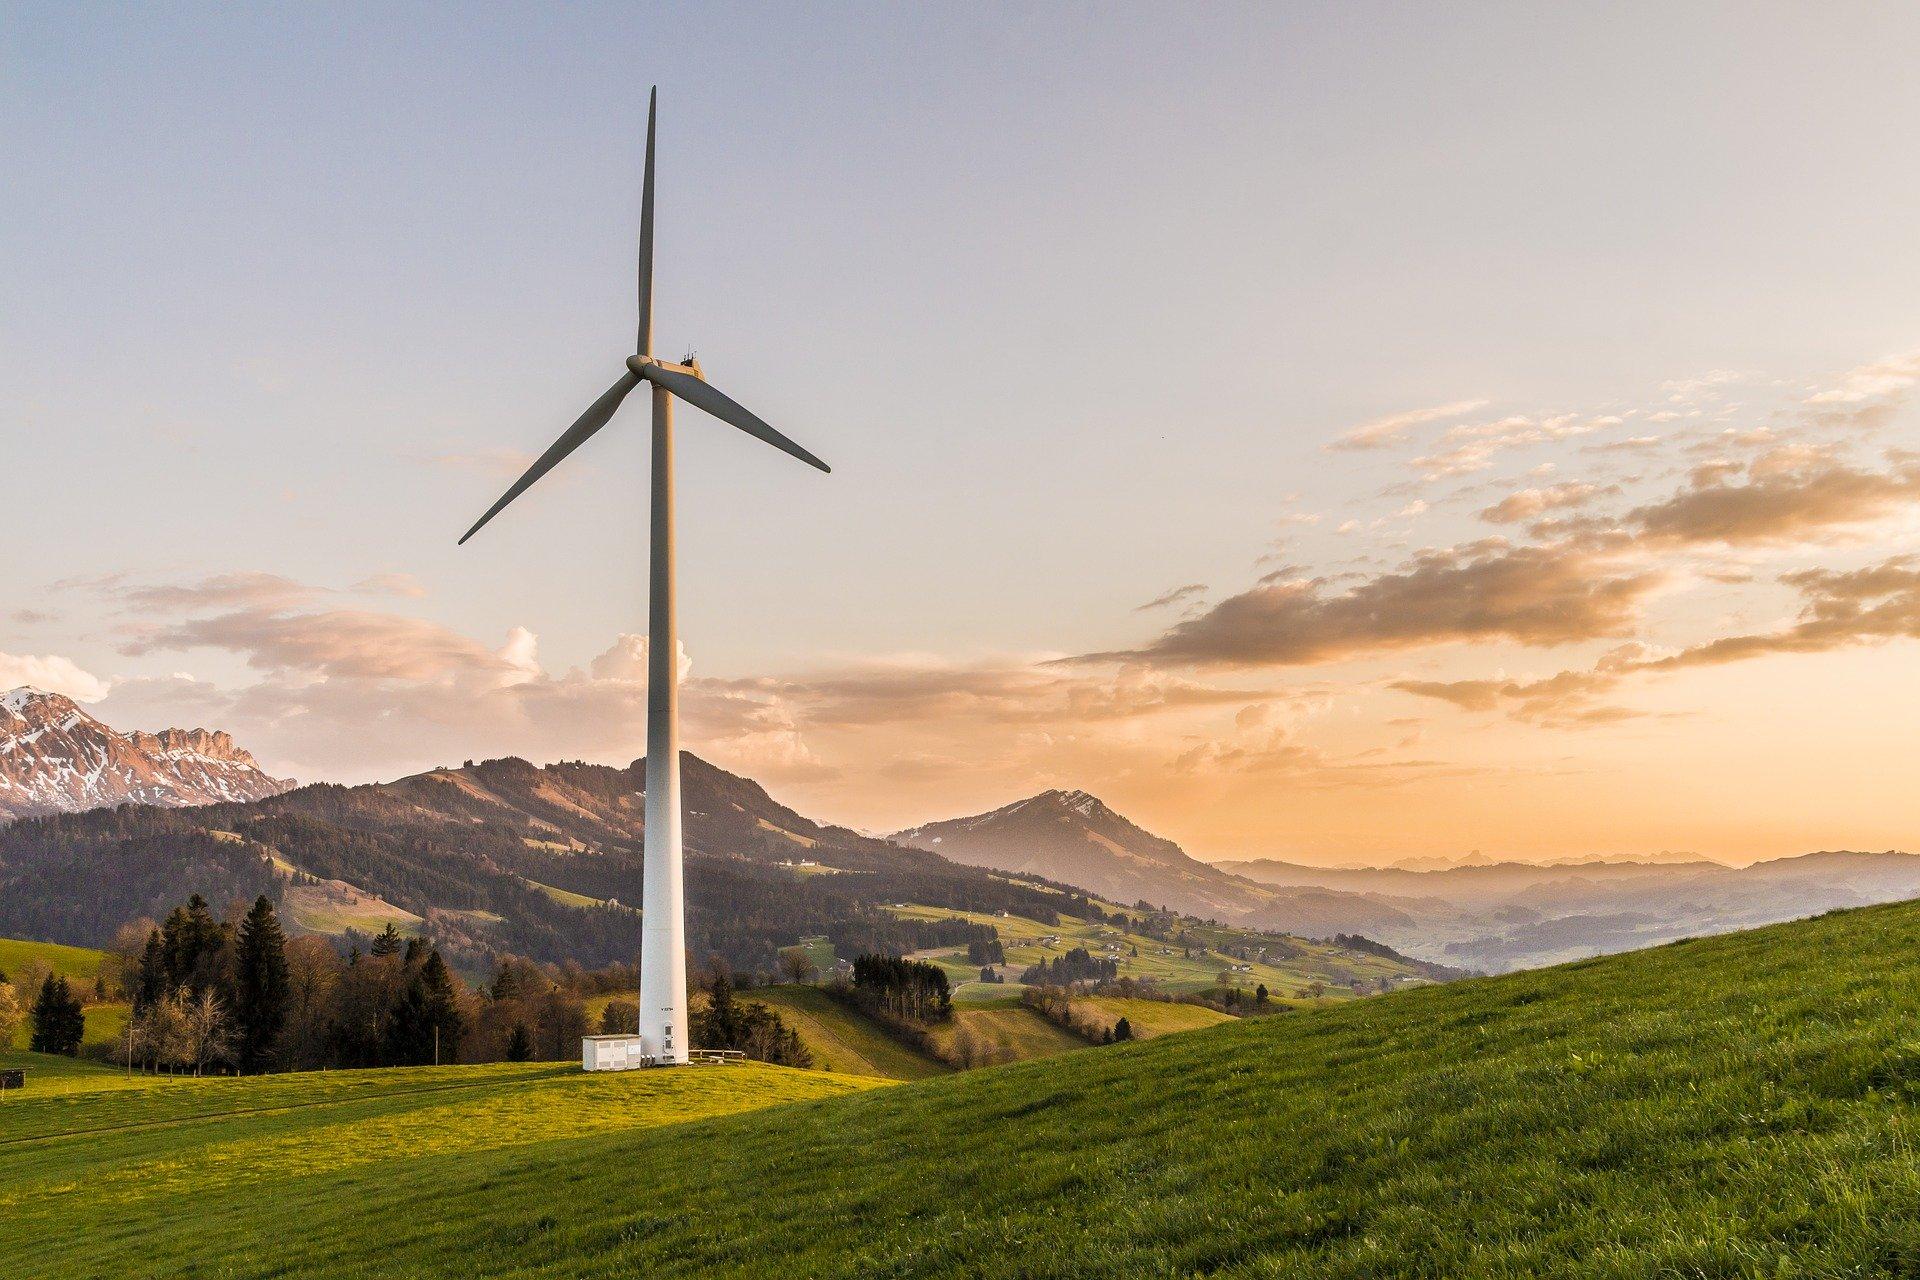 union europeenne 55 reduction ges 2030 - L'Energeek